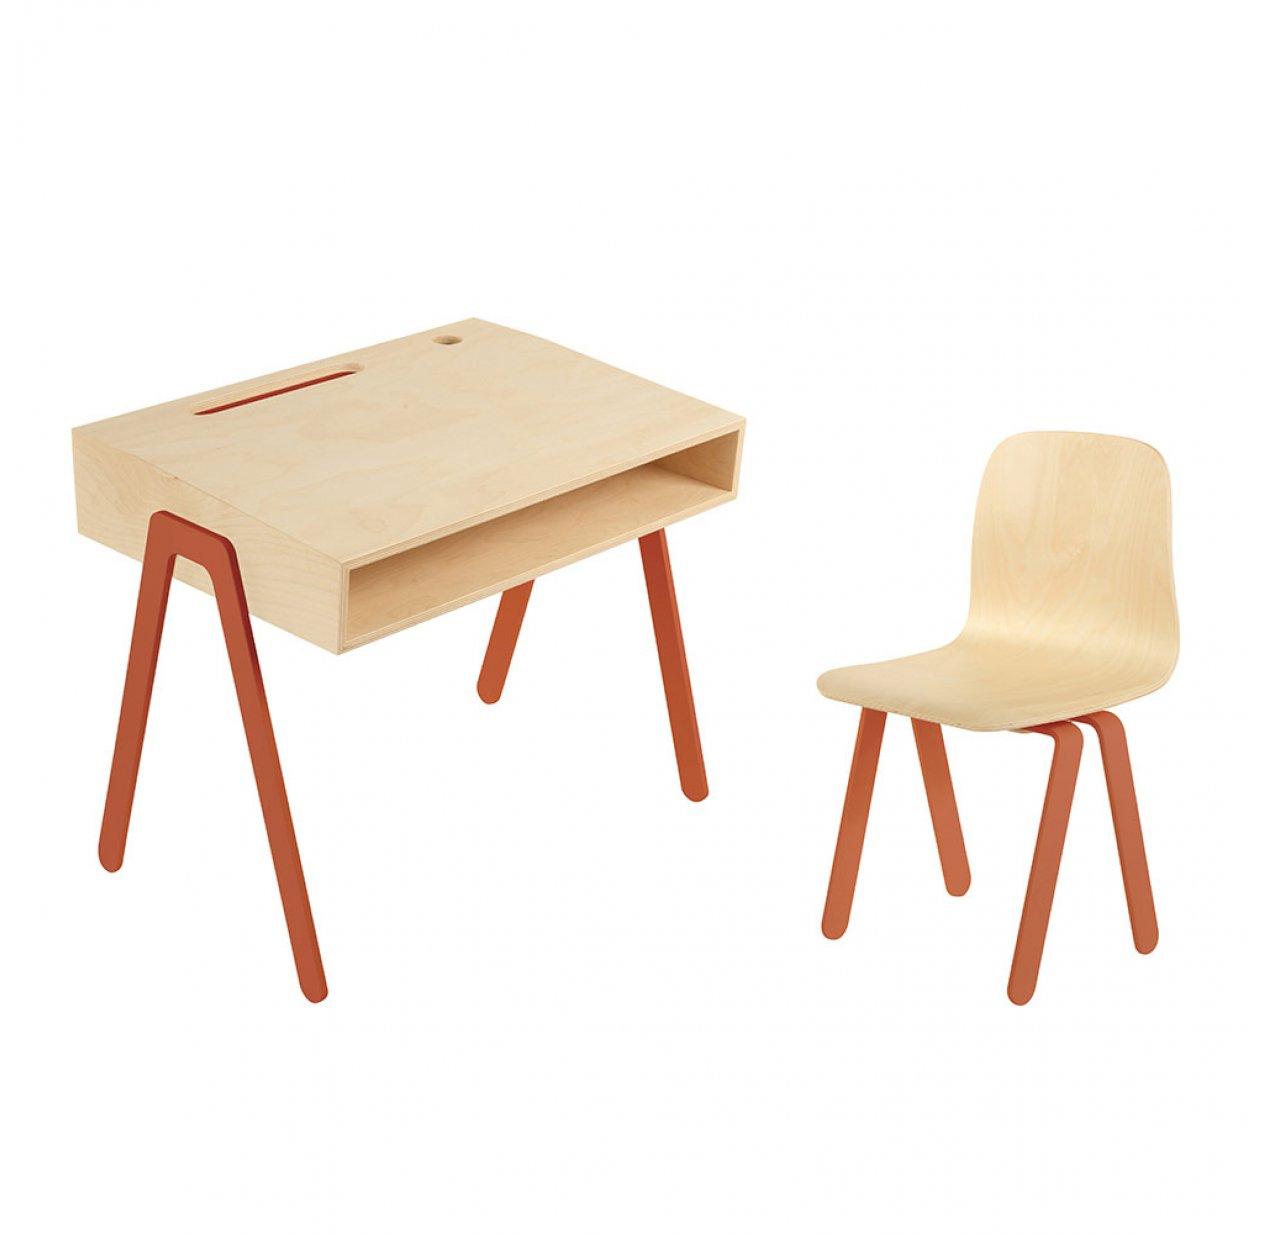 bureau et chaise enfant 2 6 ans rouge orang in2wood. Black Bedroom Furniture Sets. Home Design Ideas